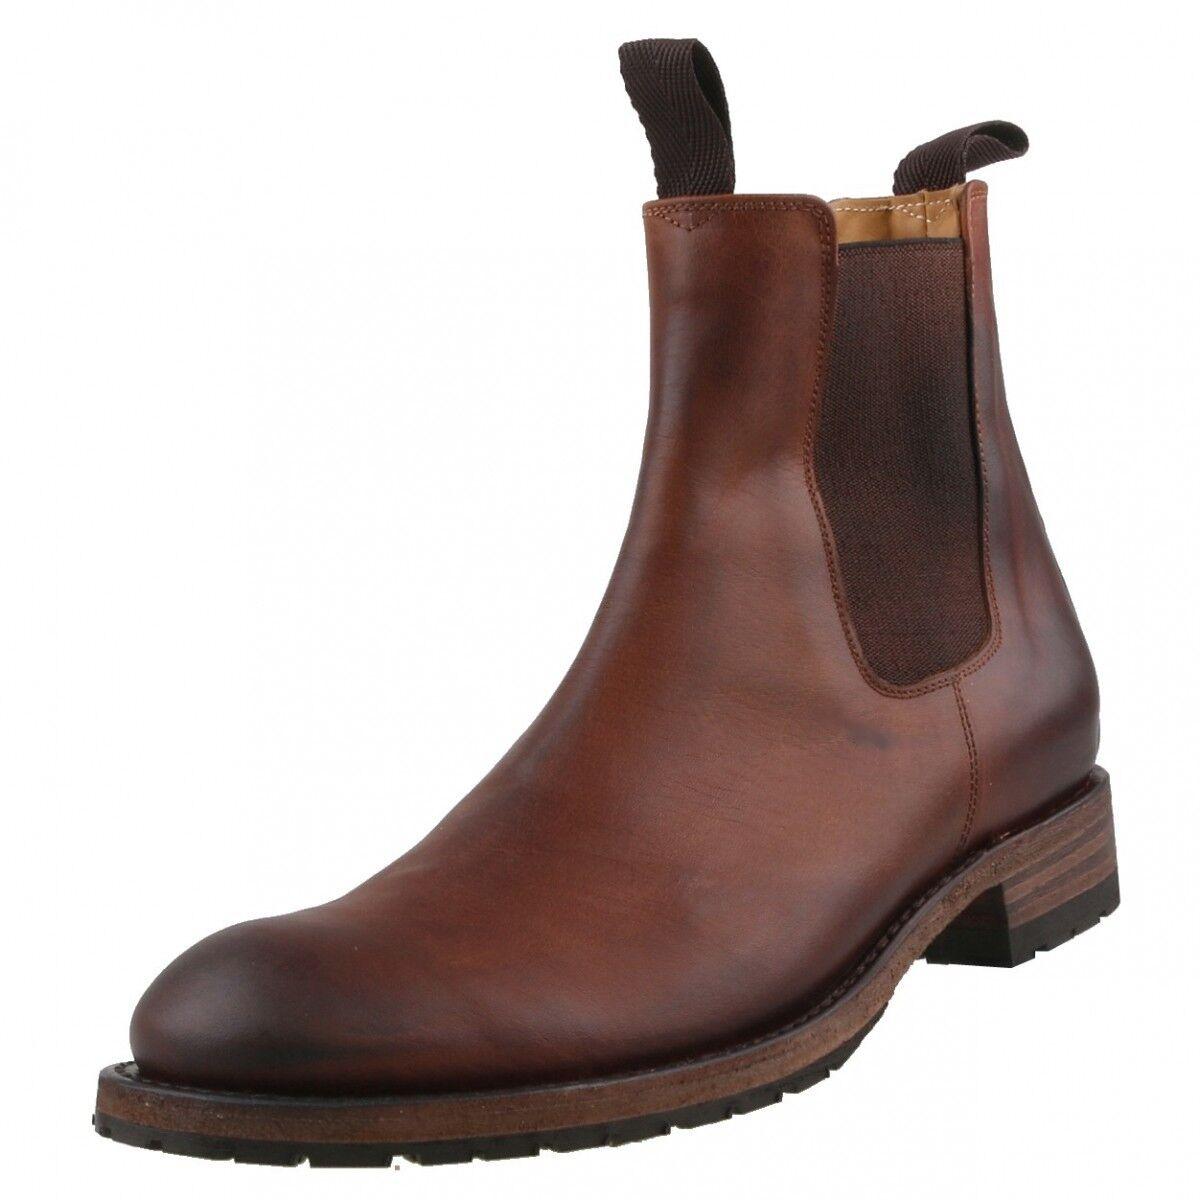 NEU SENDRA Stiefel Chelsea Stiefel 5595 Herrenschuhe Schuhe Stiefel Stiefeletten